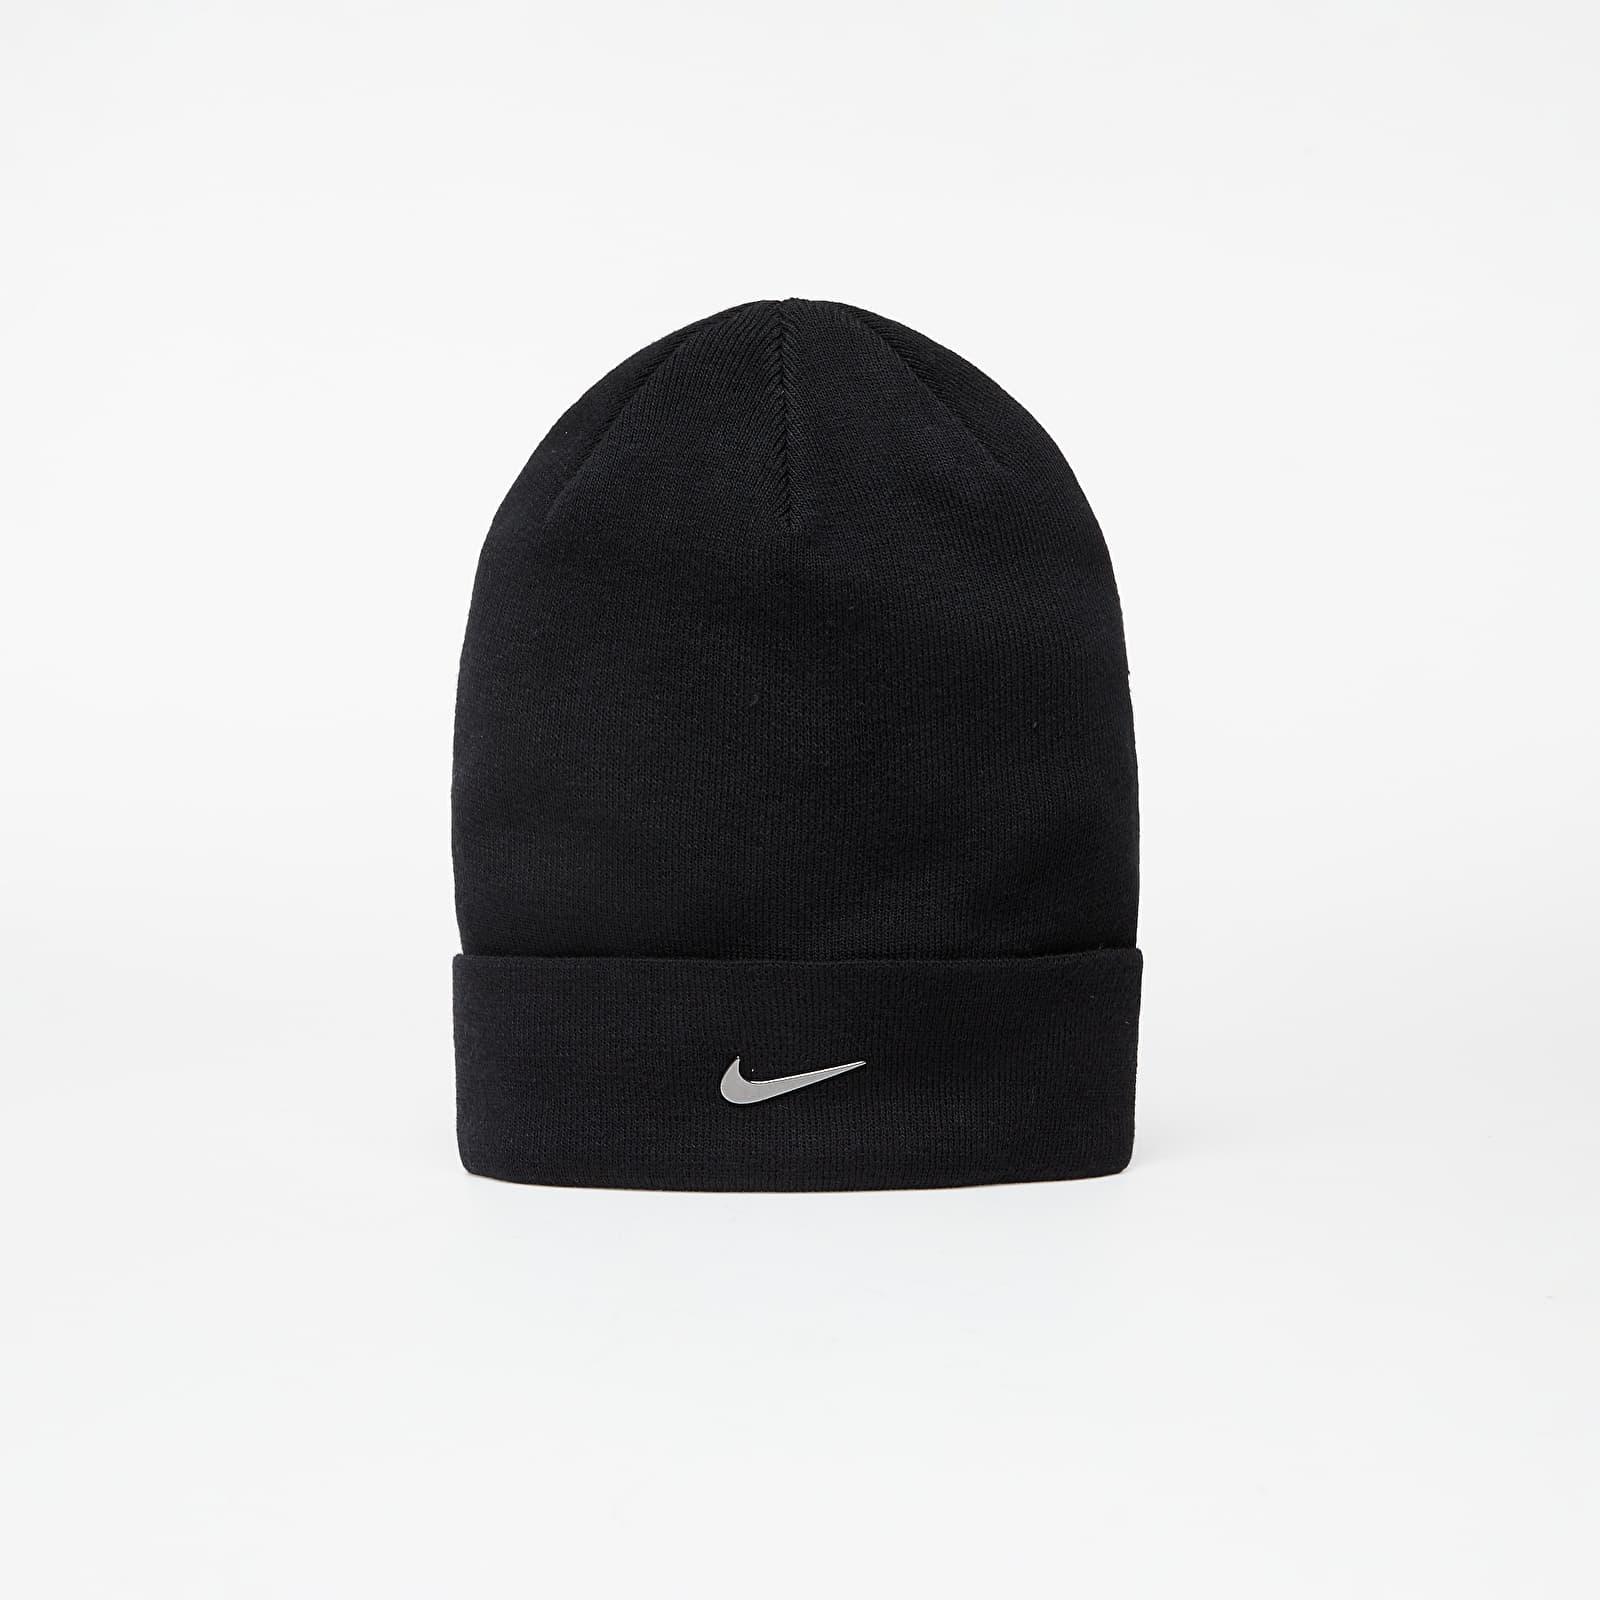 Hats Nike Sportswear Beanie Black/ Gunmetal